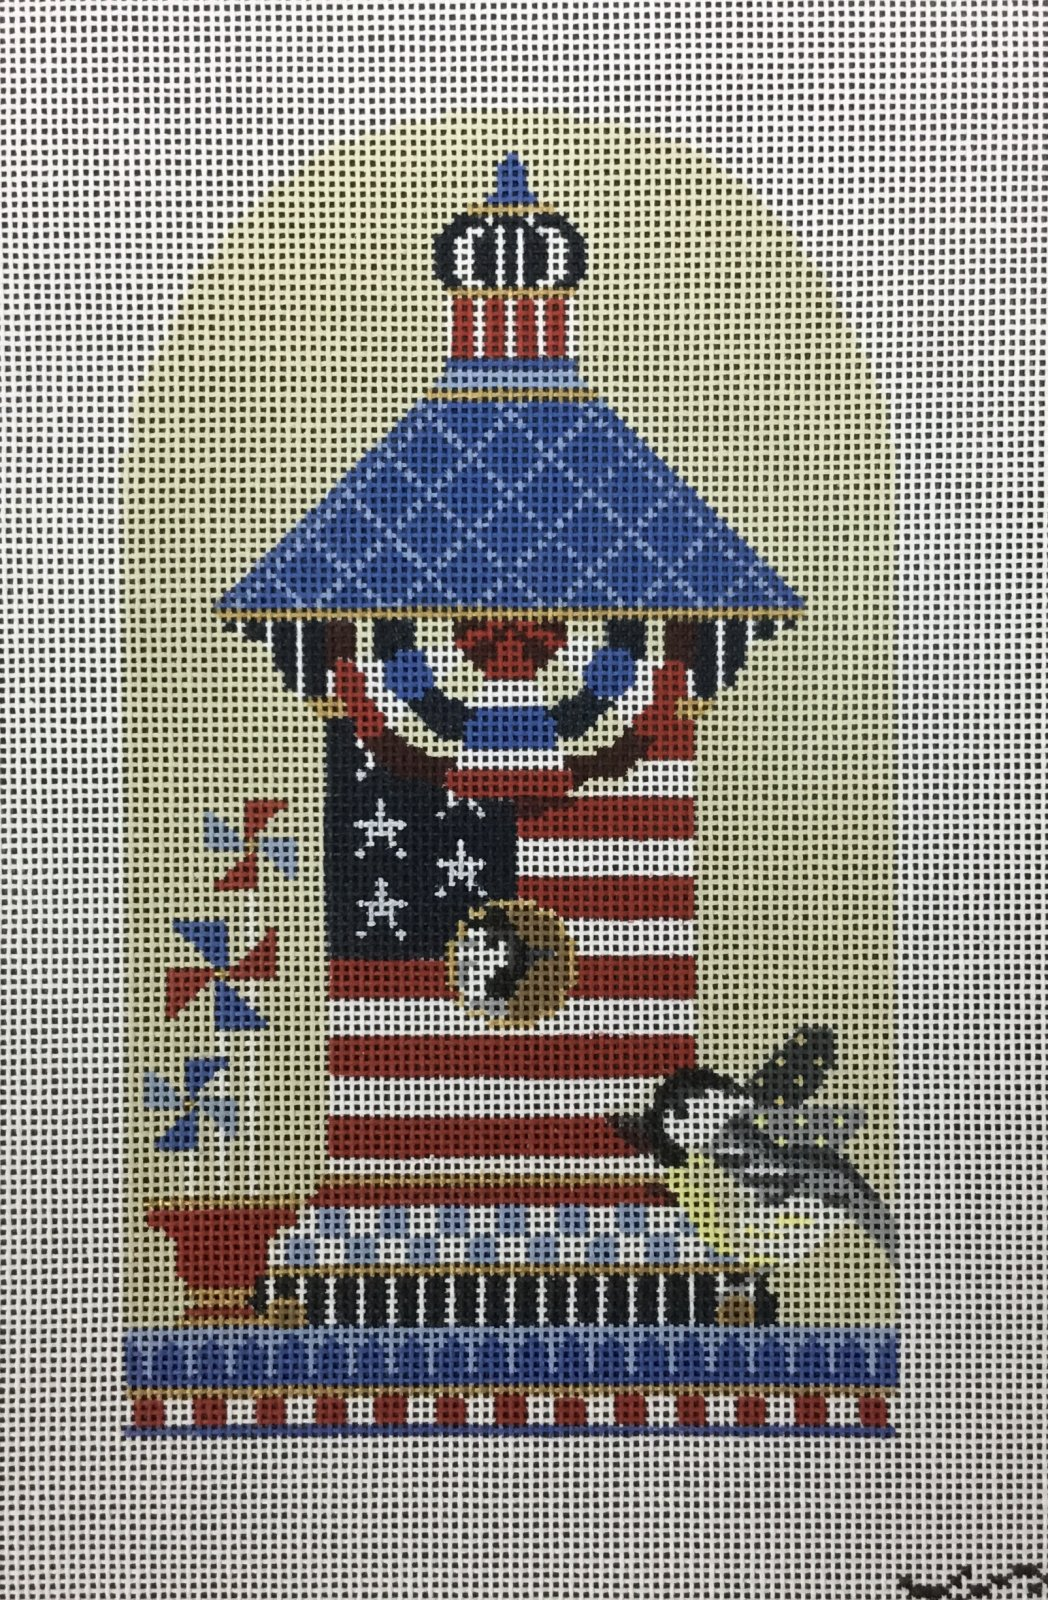 Chickadee Patriotic House, 18M, 4.25x7.25